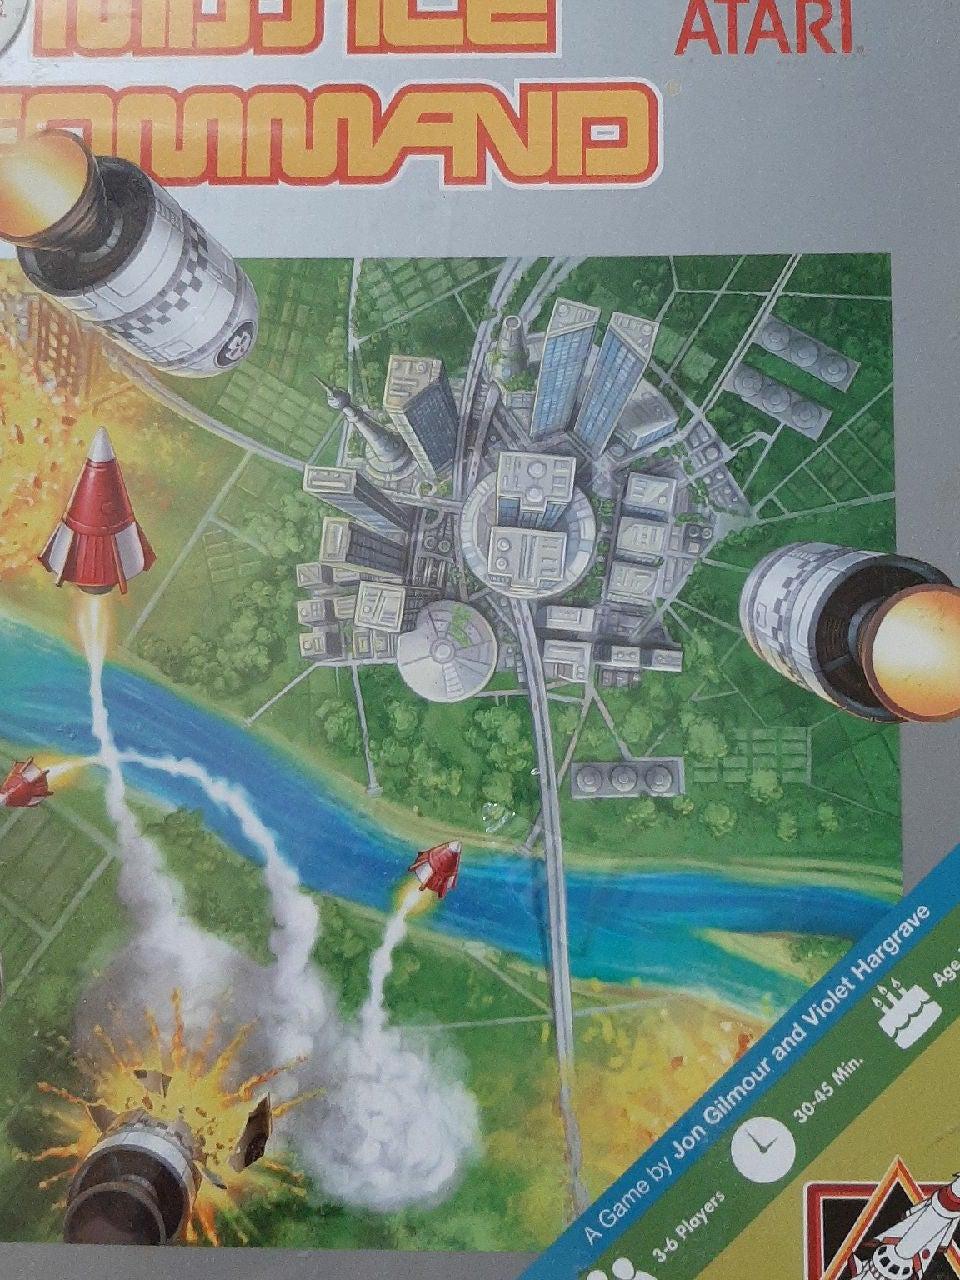 Atari Missile Command board game